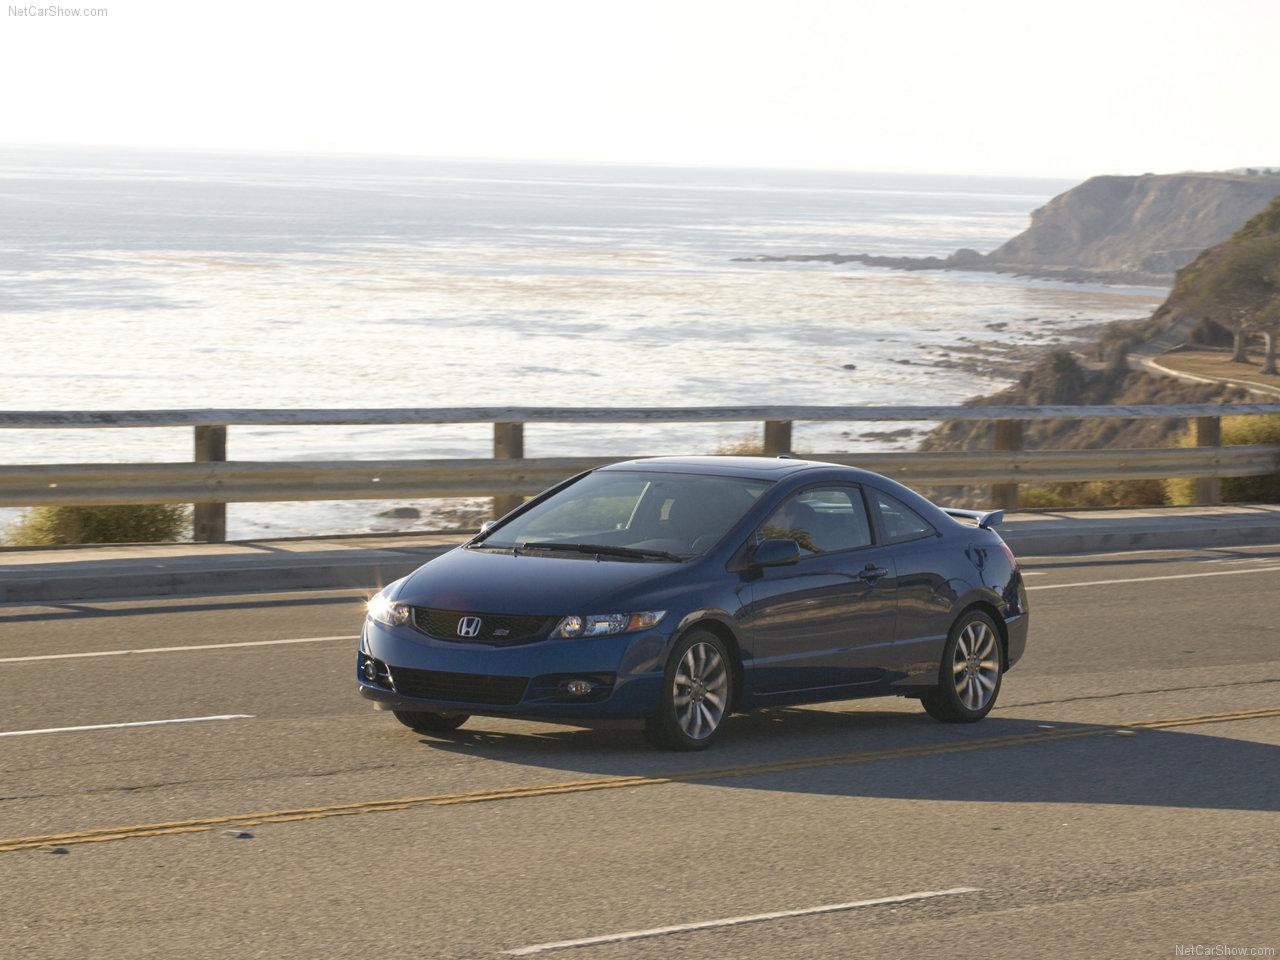 http://2.bp.blogspot.com/-BAF0fVfozqM/TYoLJK3FYfI/AAAAAAAADCY/27oT40j2Njk/s1600/Honda-Civic_Si_Coupe_2009_1280x960_wallpaper_03.jpg